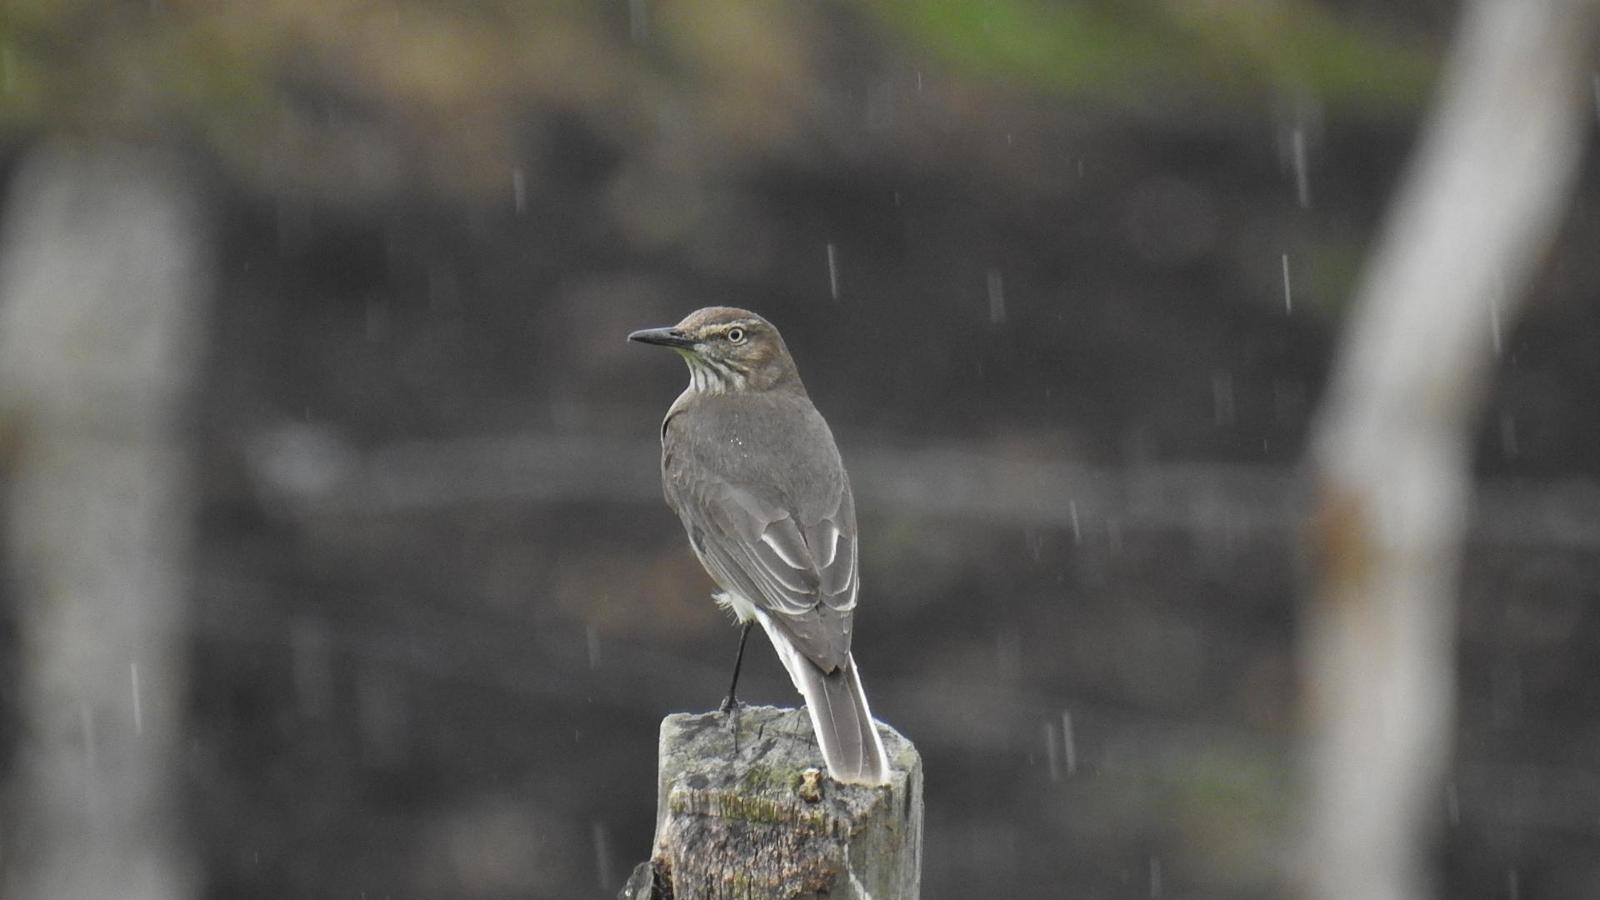 Black-billed Shrike-Tyrant Photo by Julio Delgado